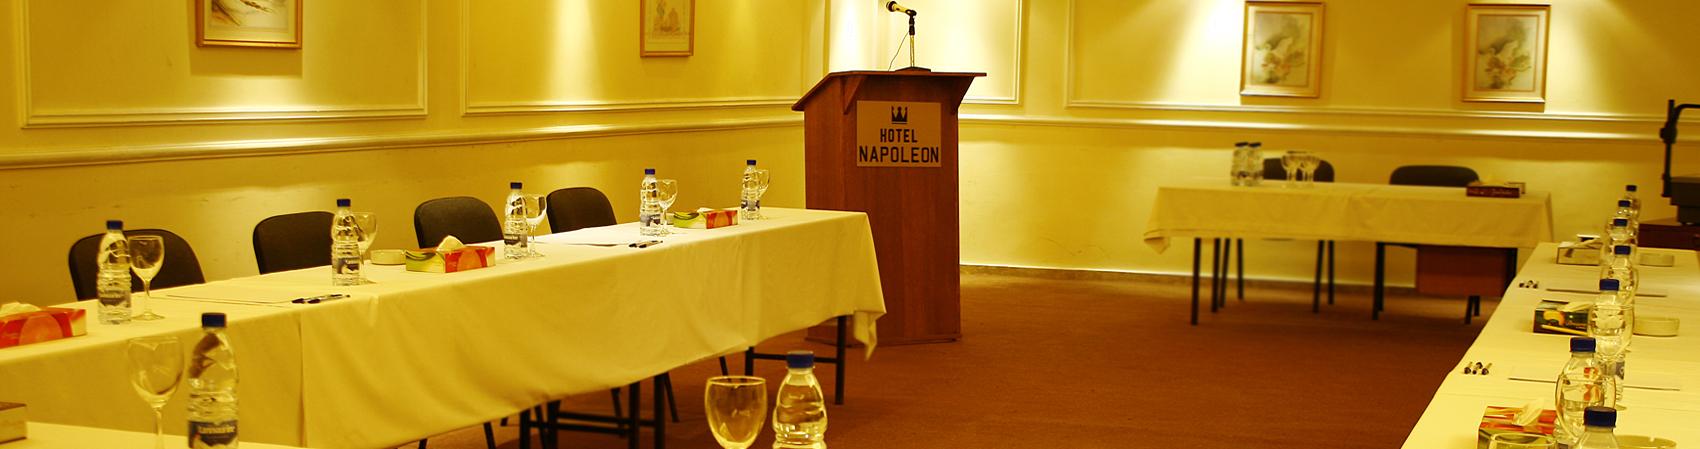 Conference-room-copy1